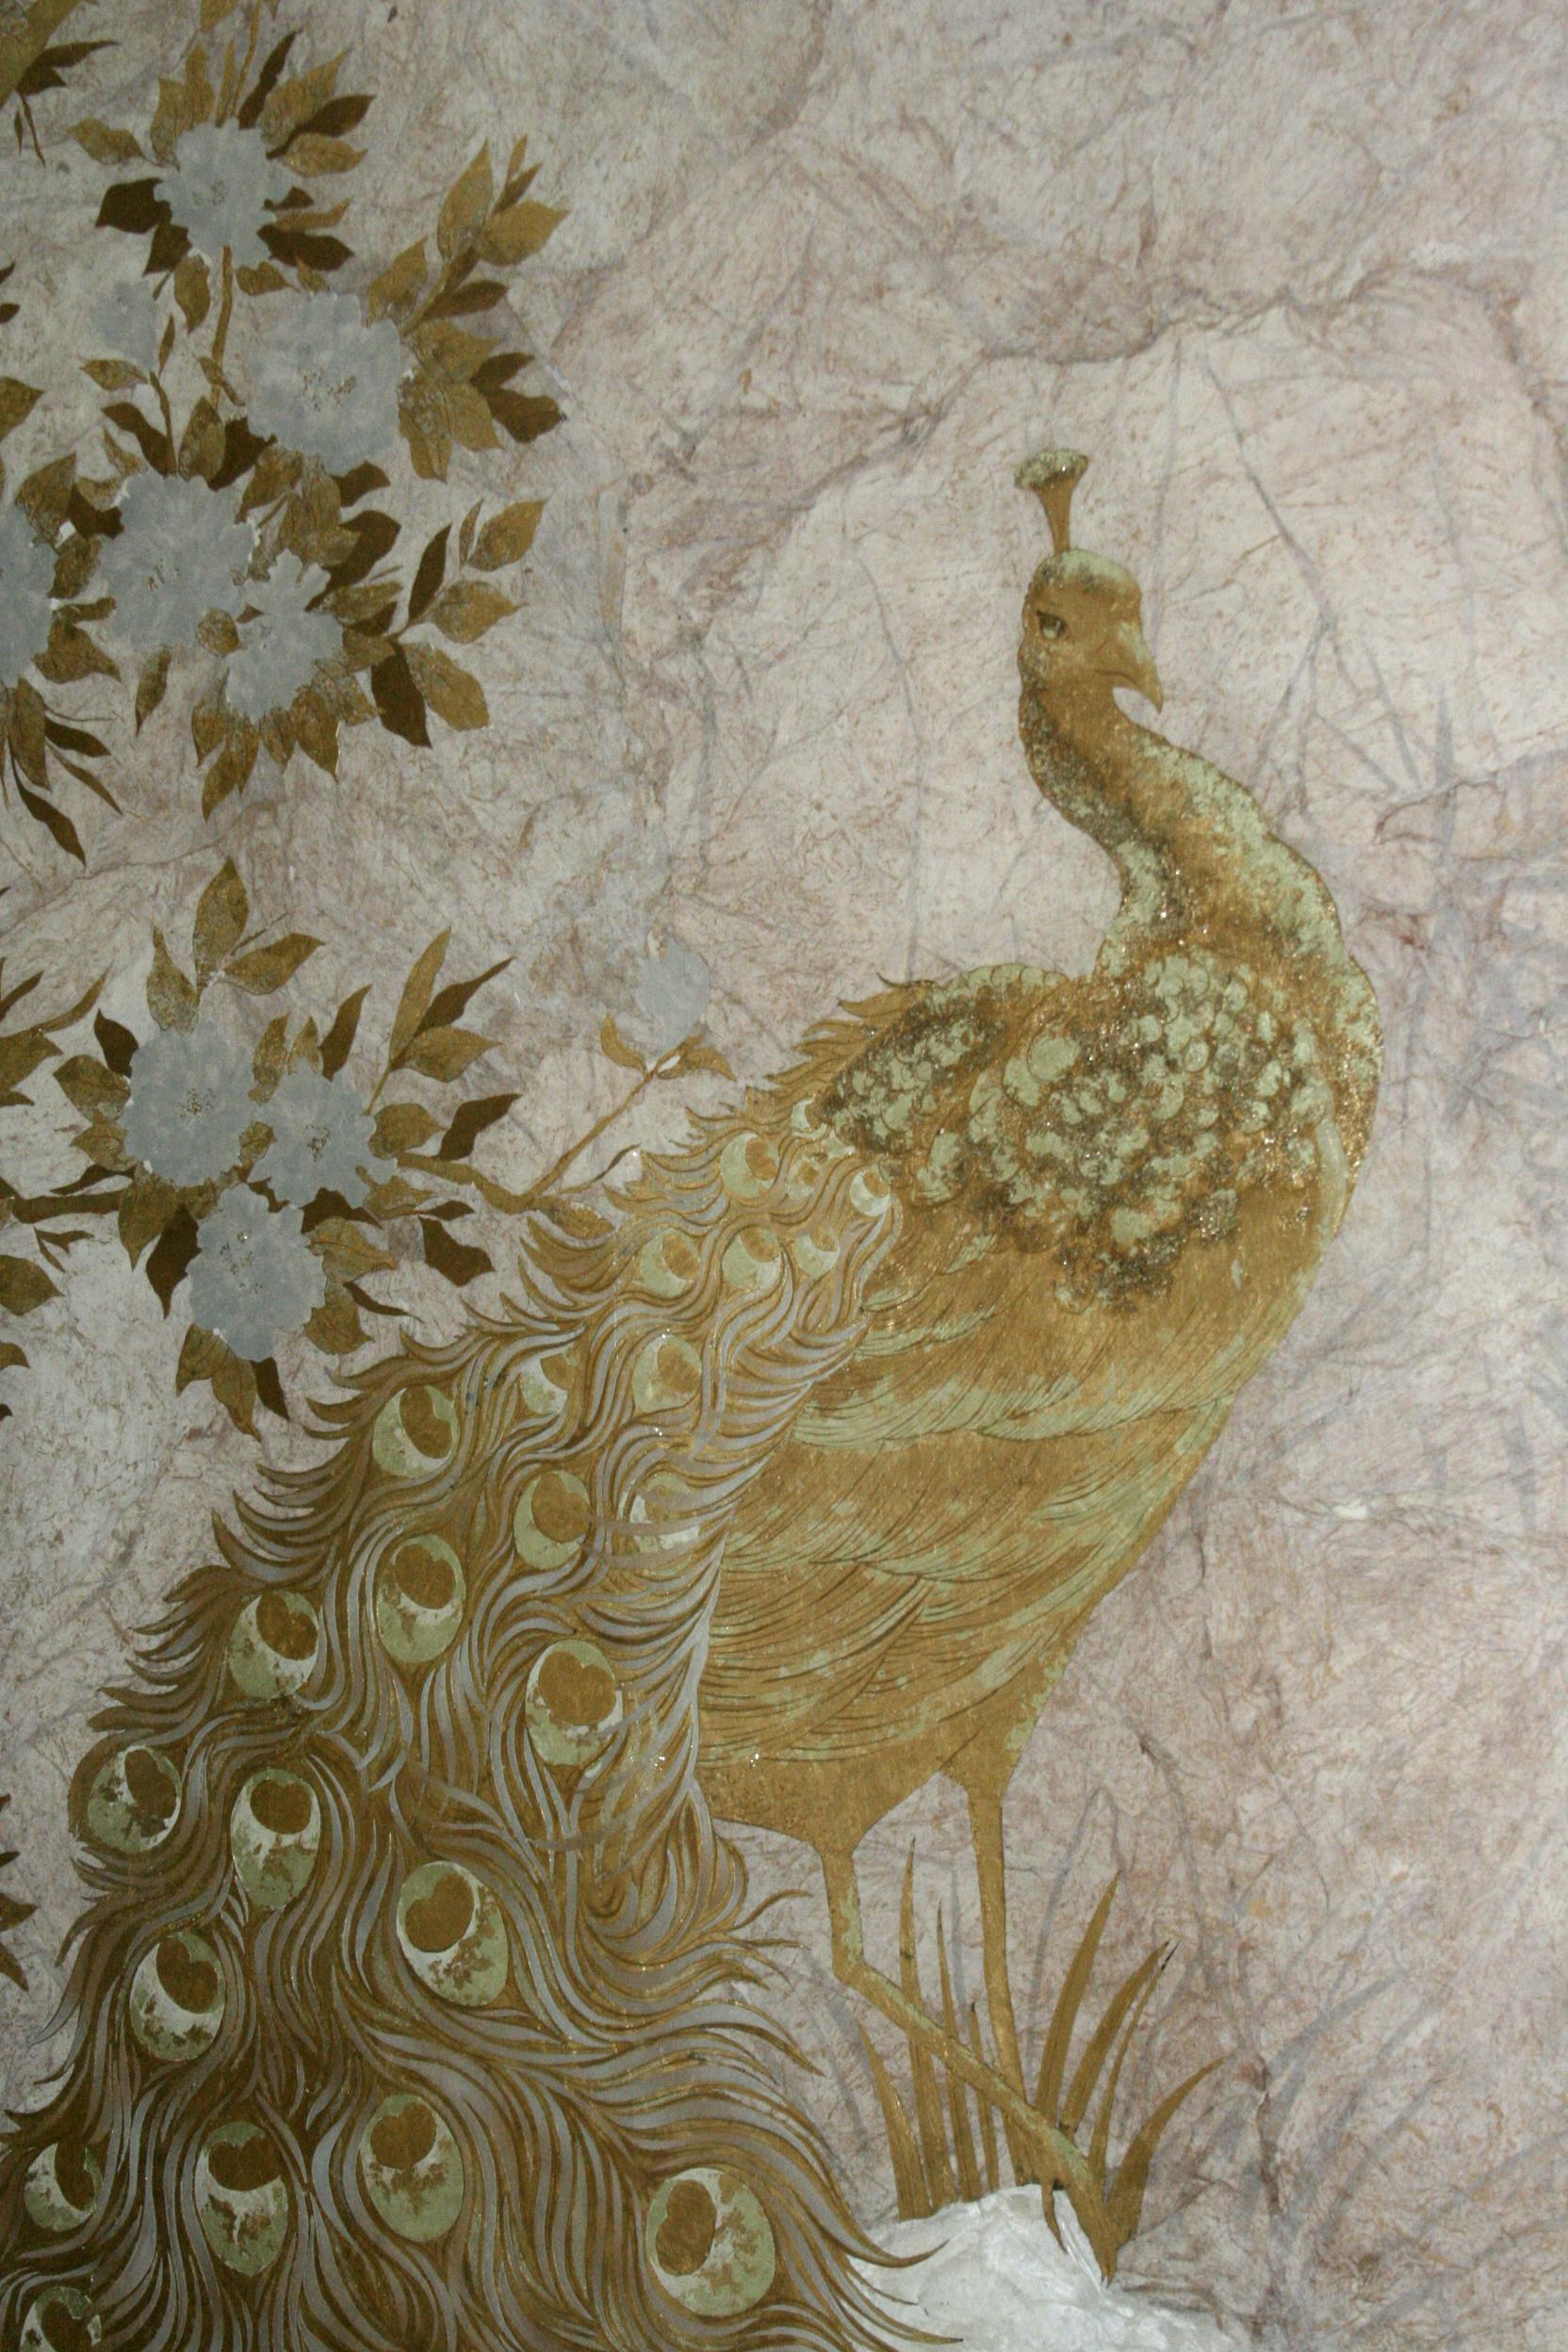 decorative glass - peacock detail